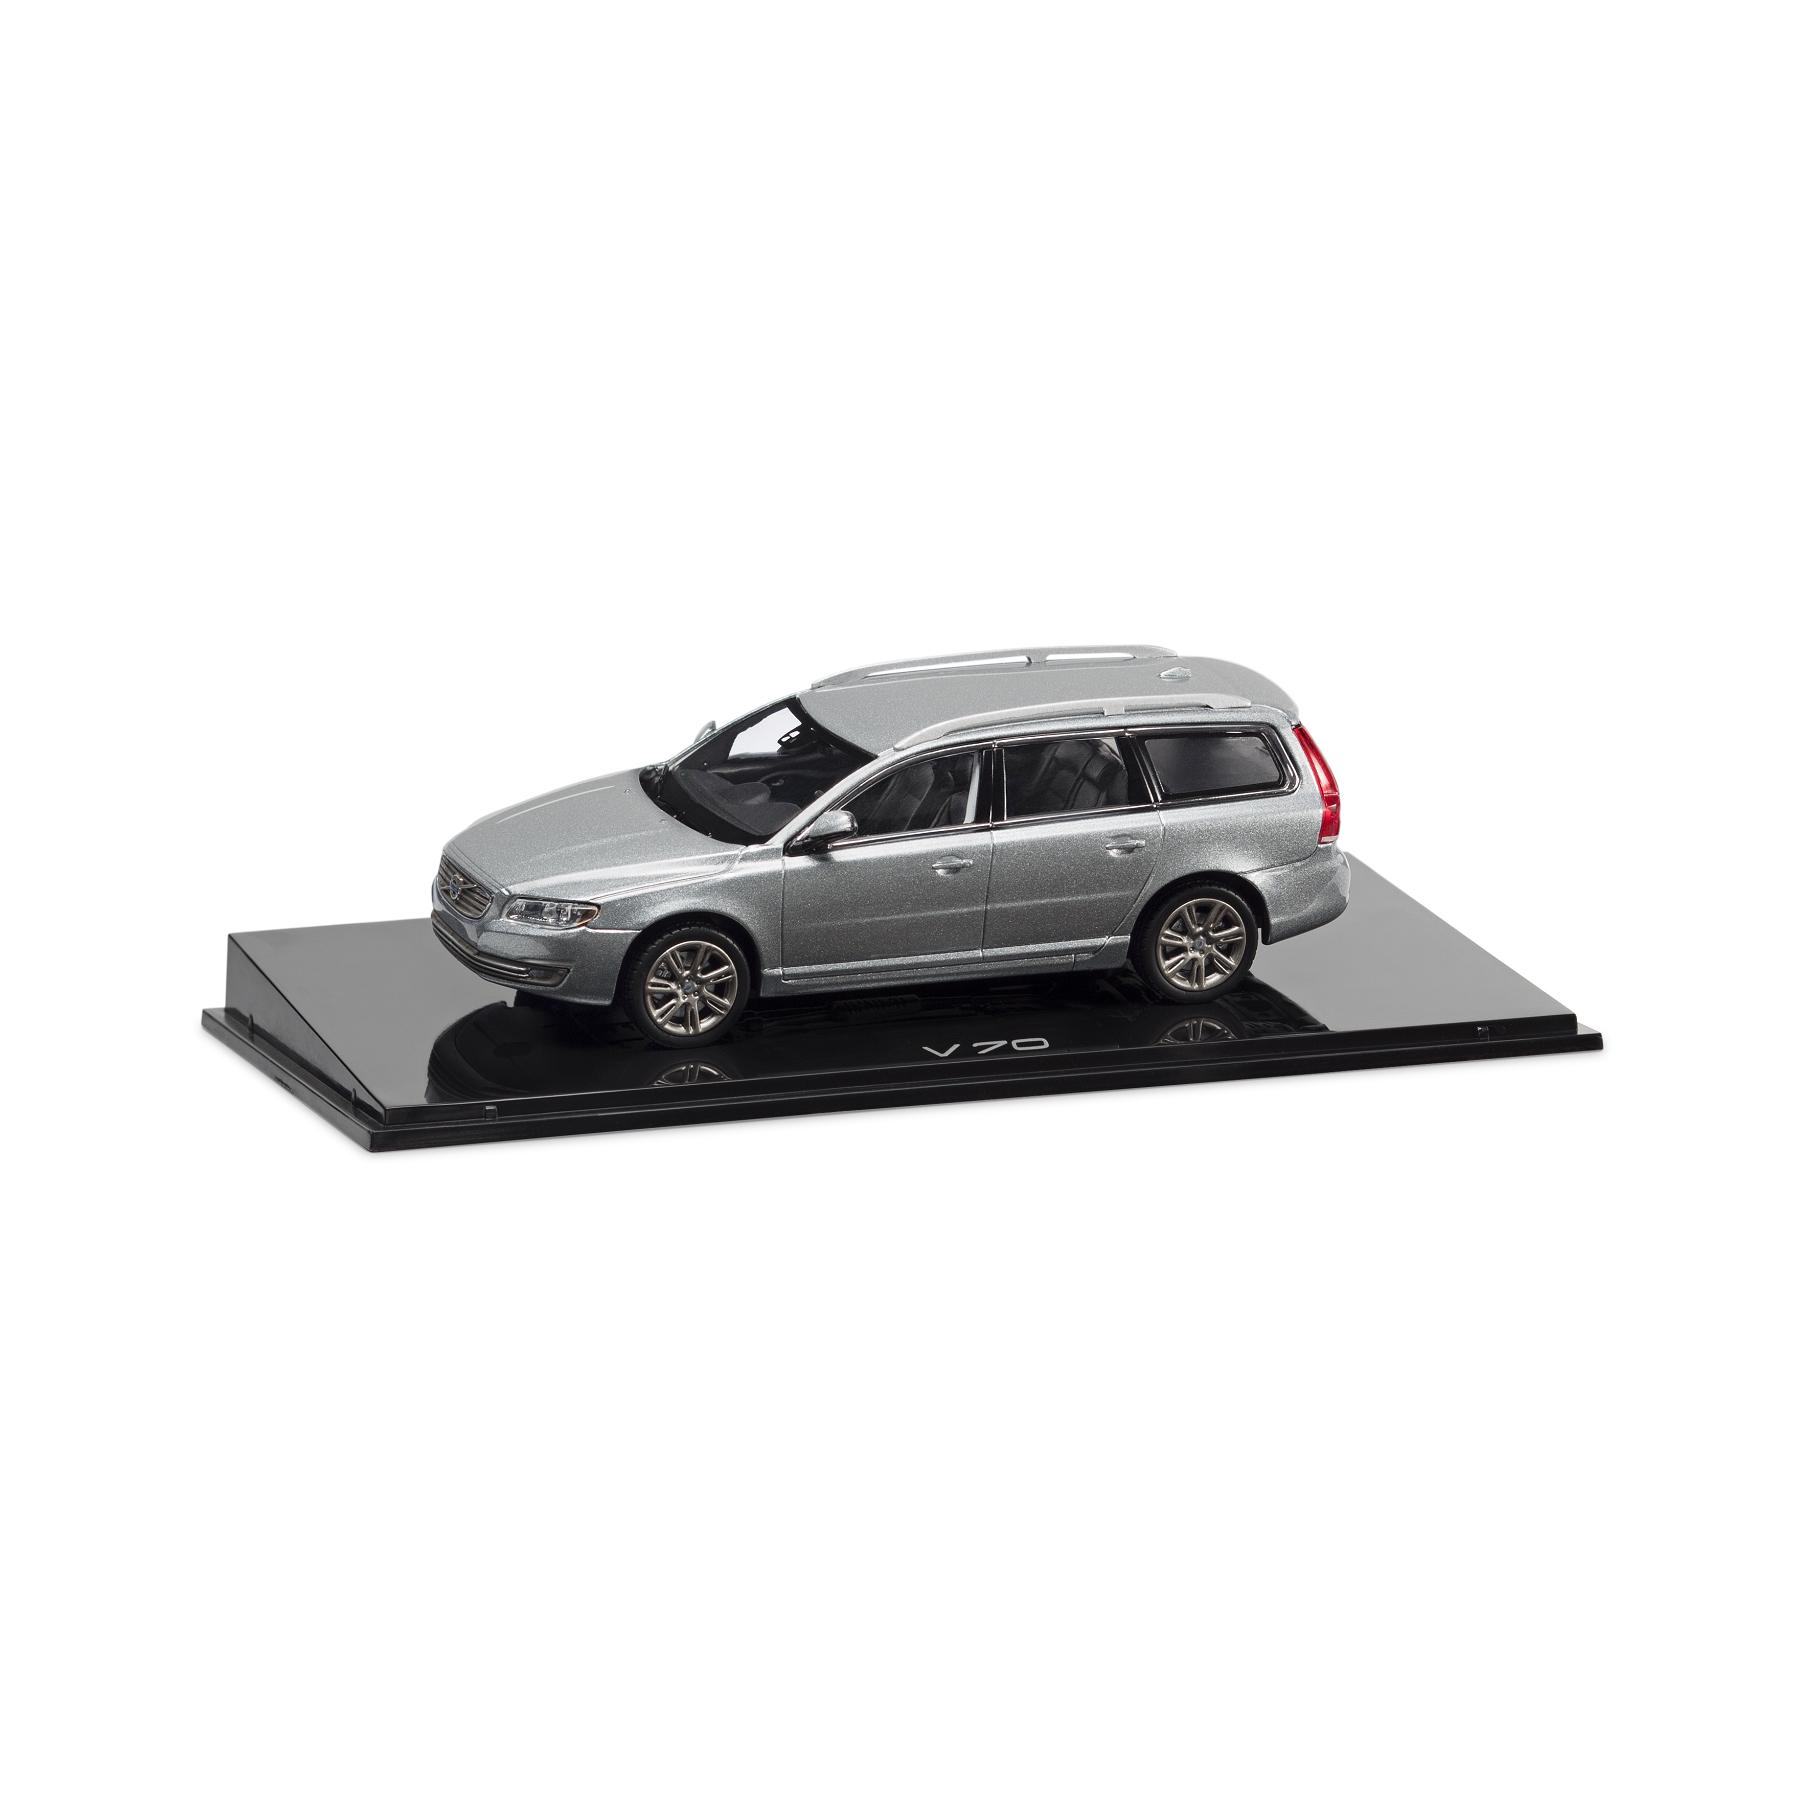 Volvo Car Lifestyle Collection Shop Model Cars Autos Post